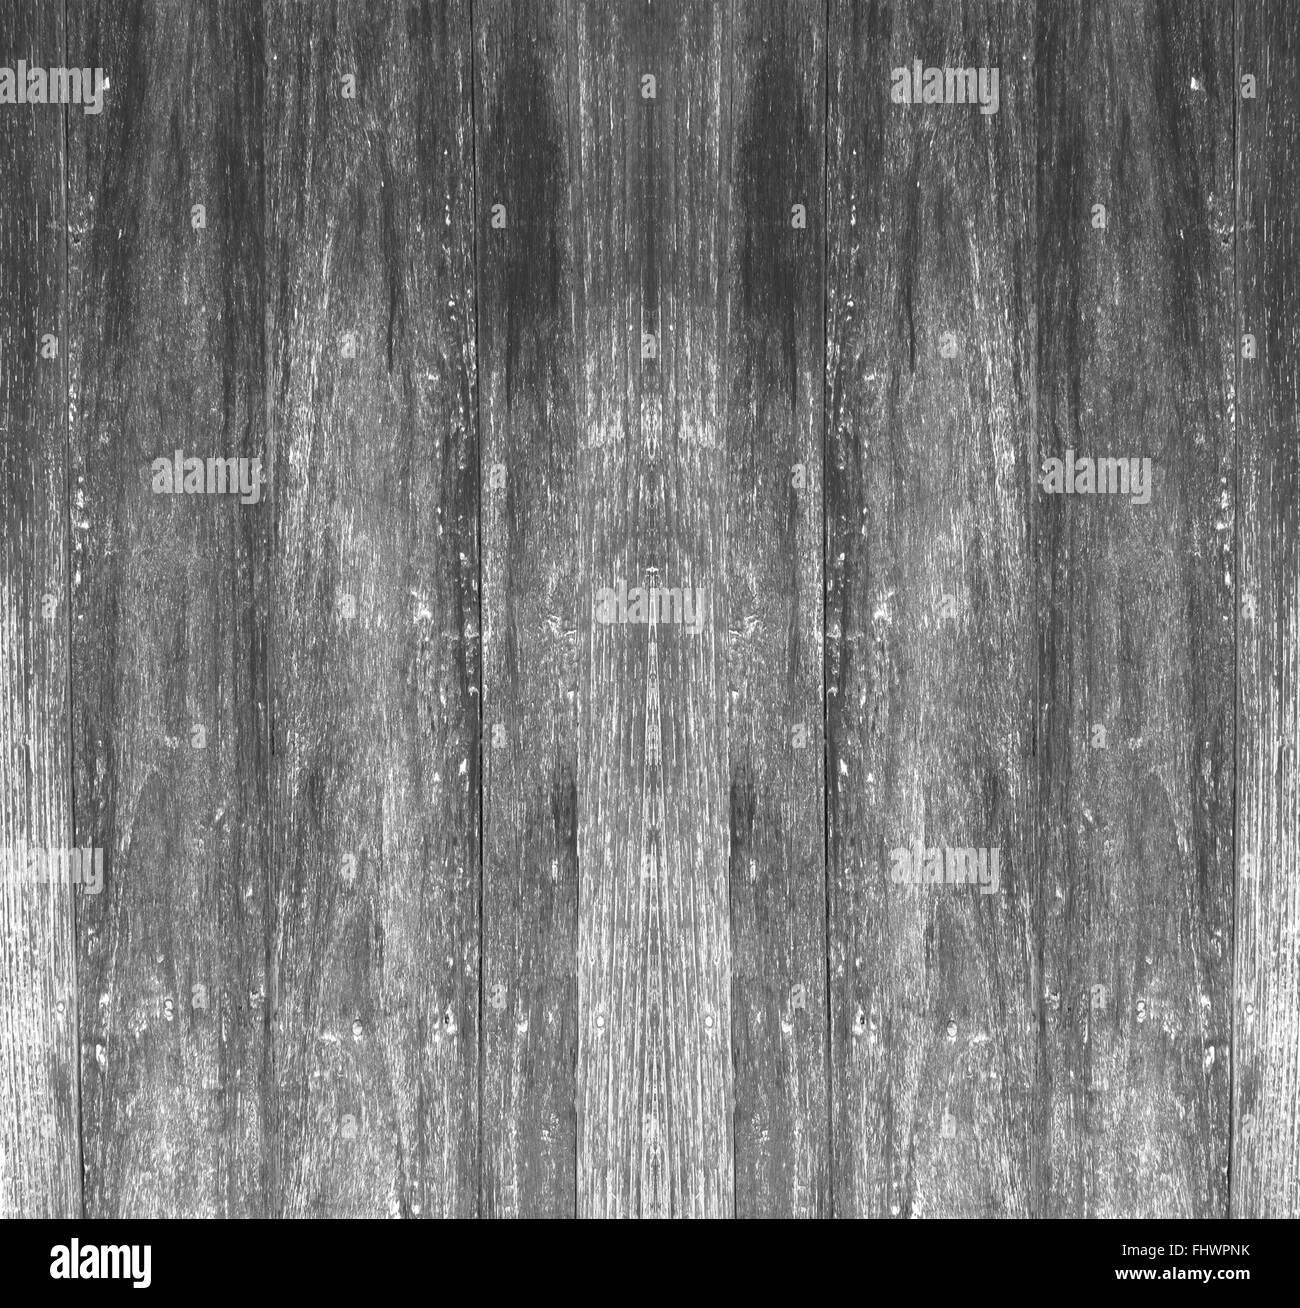 Wooden planks black background old vintage antique style textured background. - Stock Image